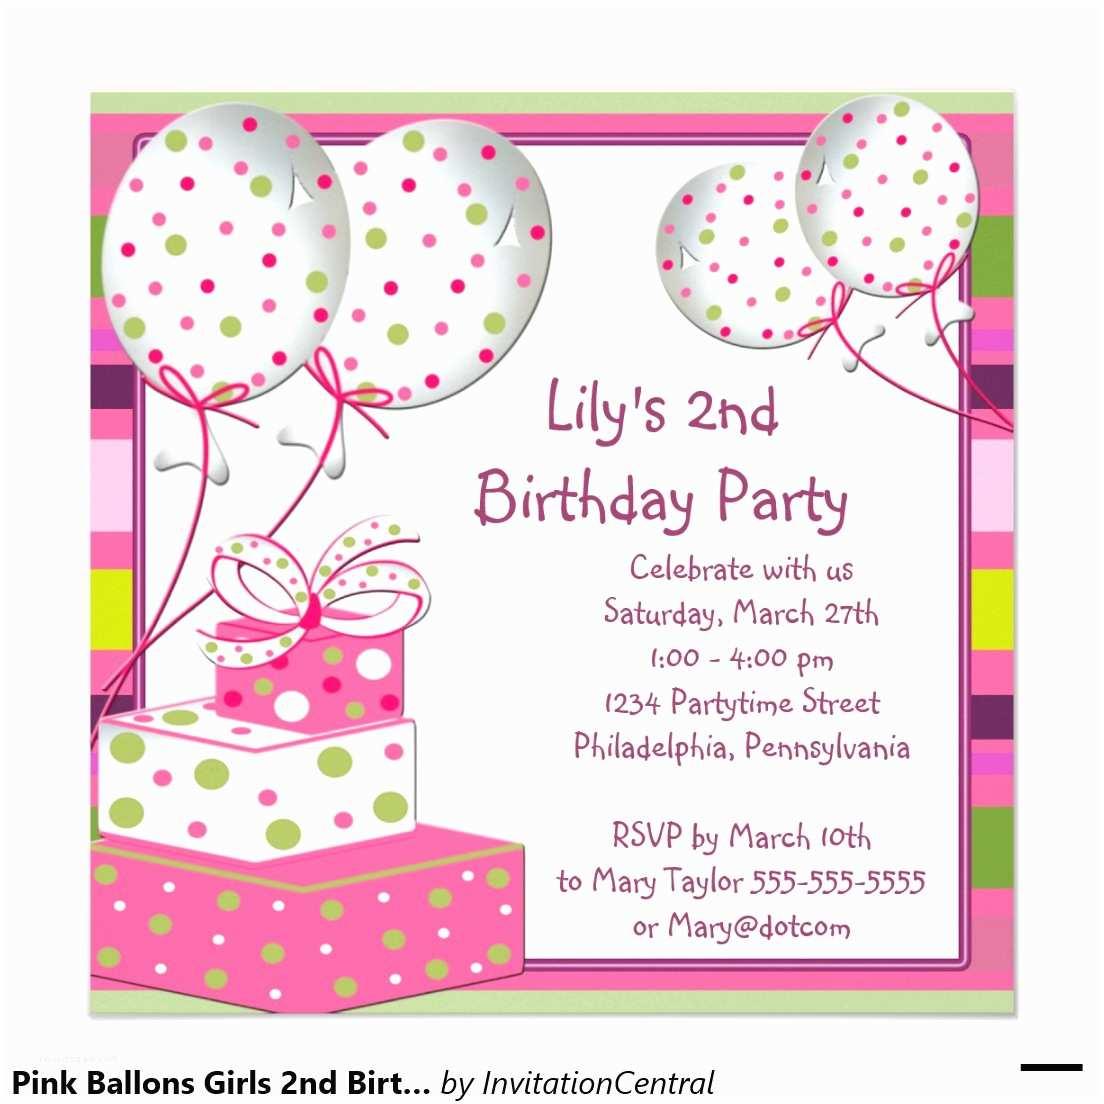 Online Party Invitations 10 Imposing Invitation Birthday Party